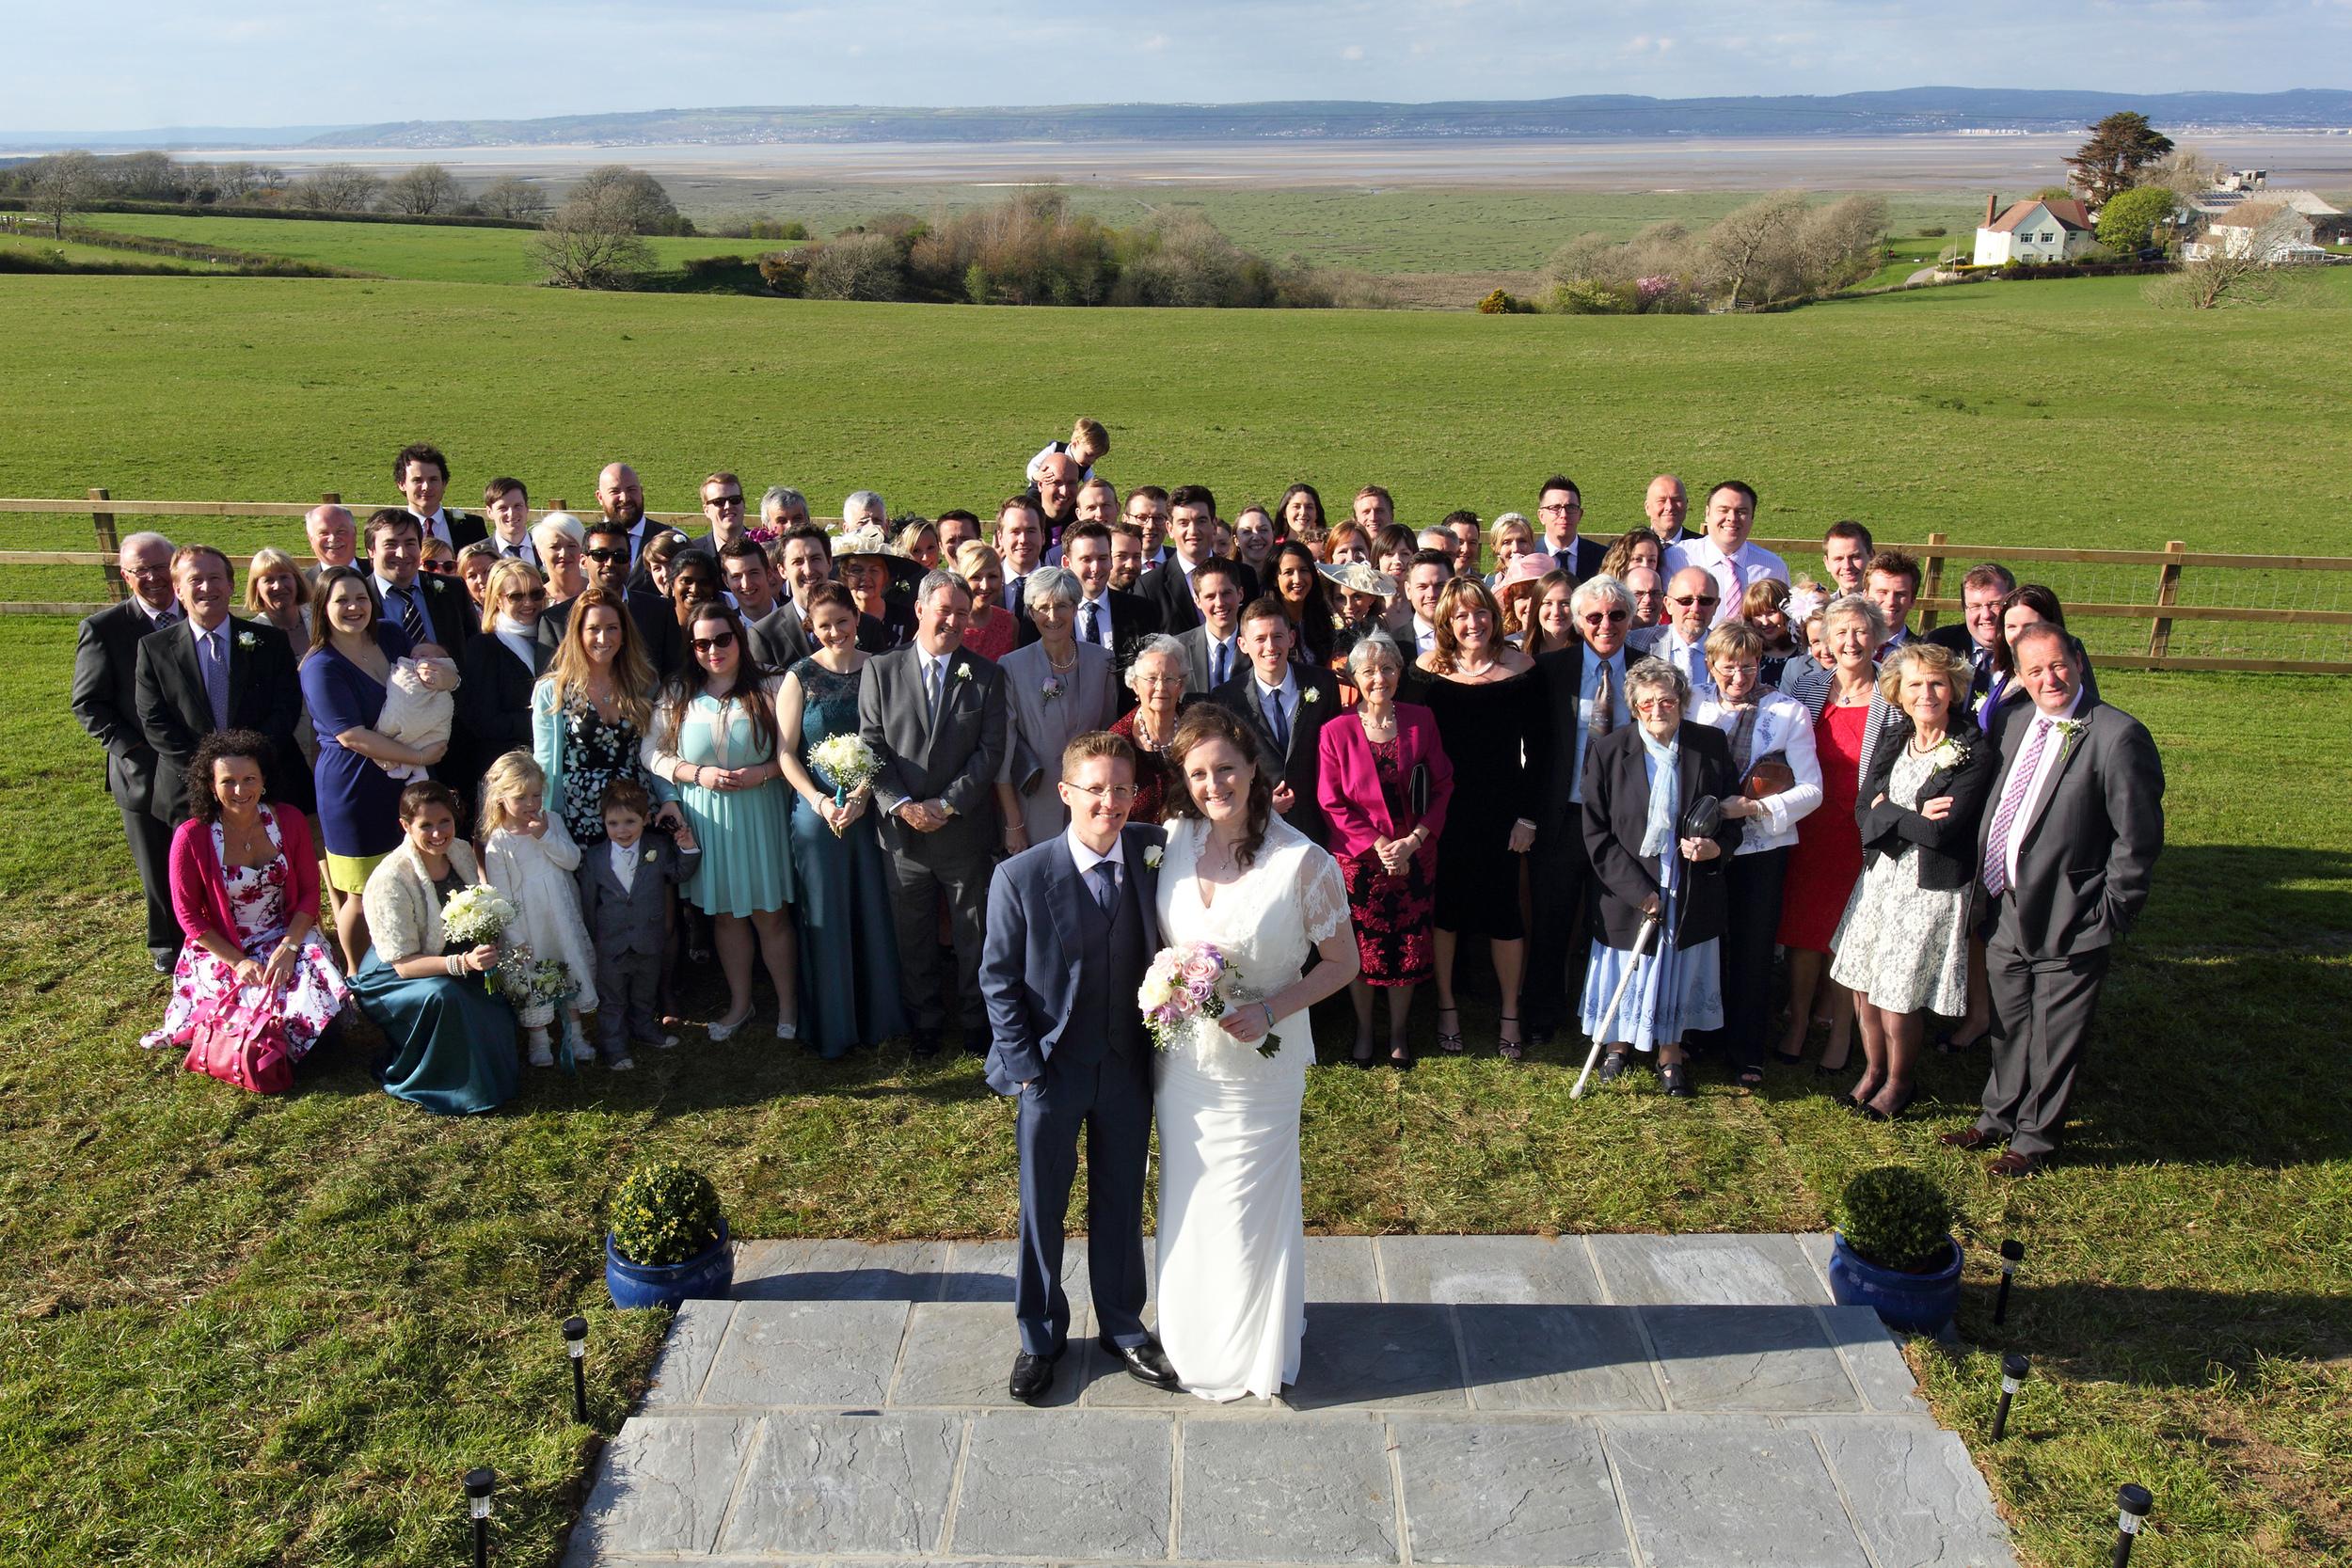 Ocean-View-Gower-Wedding-Photographer-048.JPG